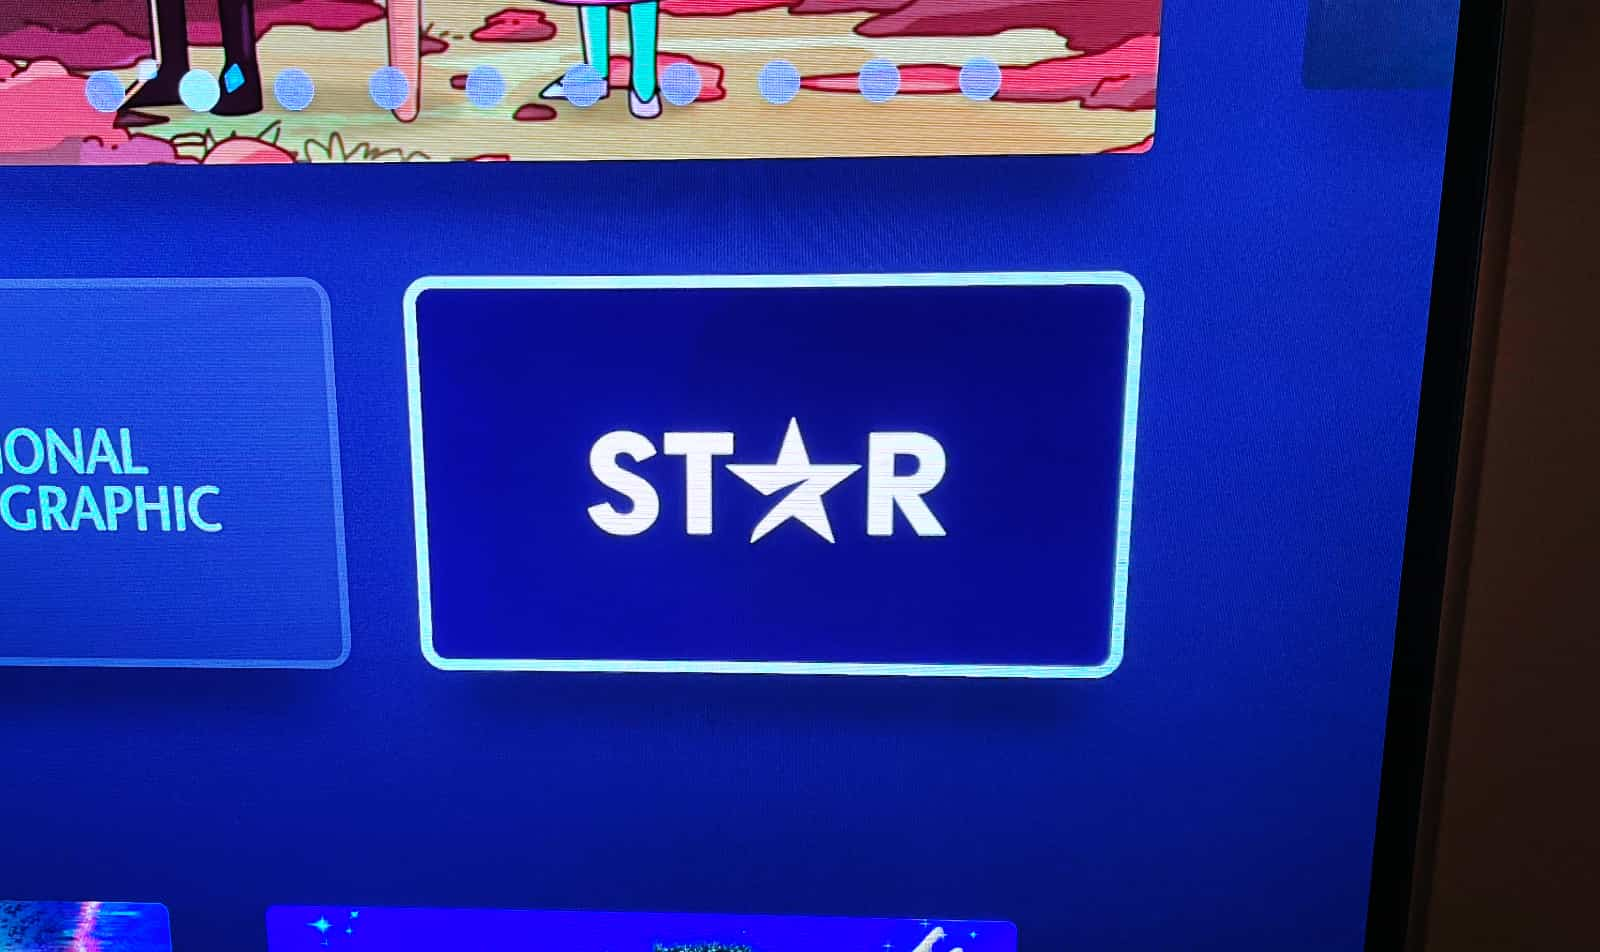 Star app on Disney+